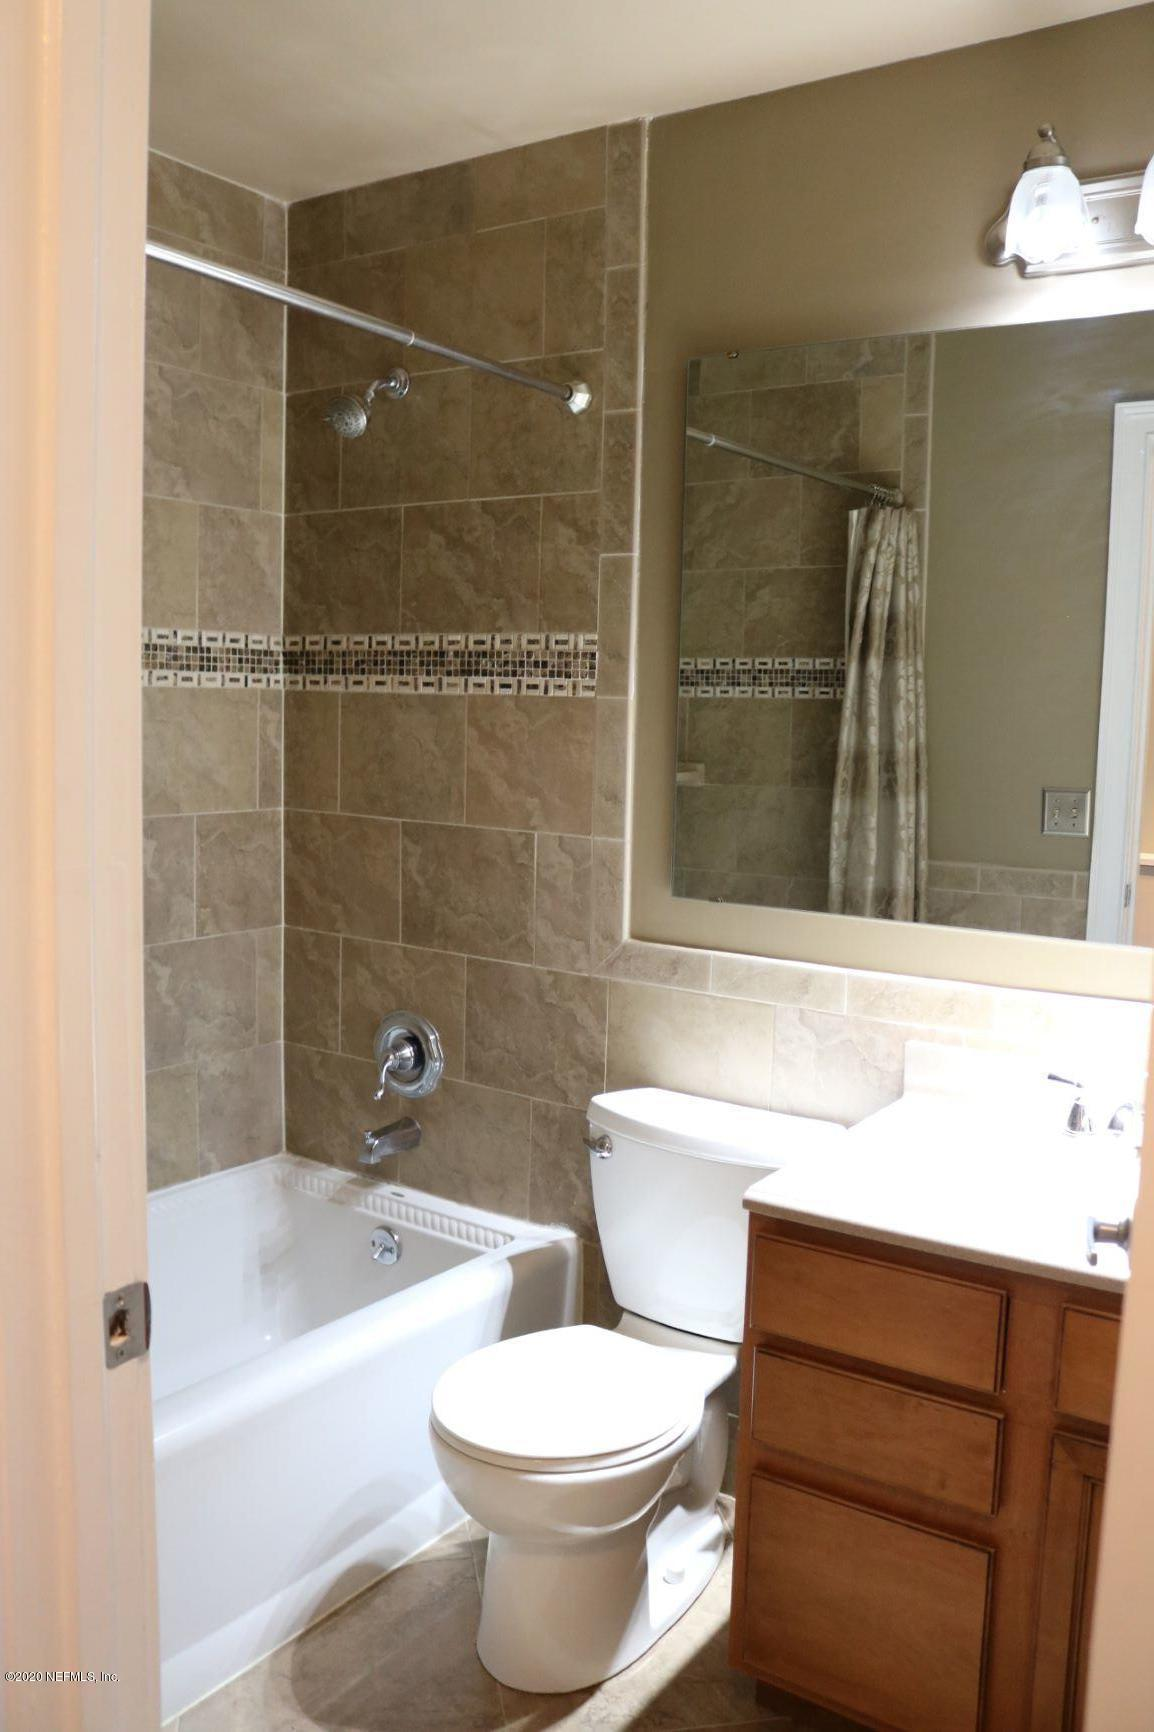 14750 BEACH, JACKSONVILLE, FLORIDA 32250, 2 Bedrooms Bedrooms, ,2 BathroomsBathrooms,Residential,For sale,BEACH,1080945